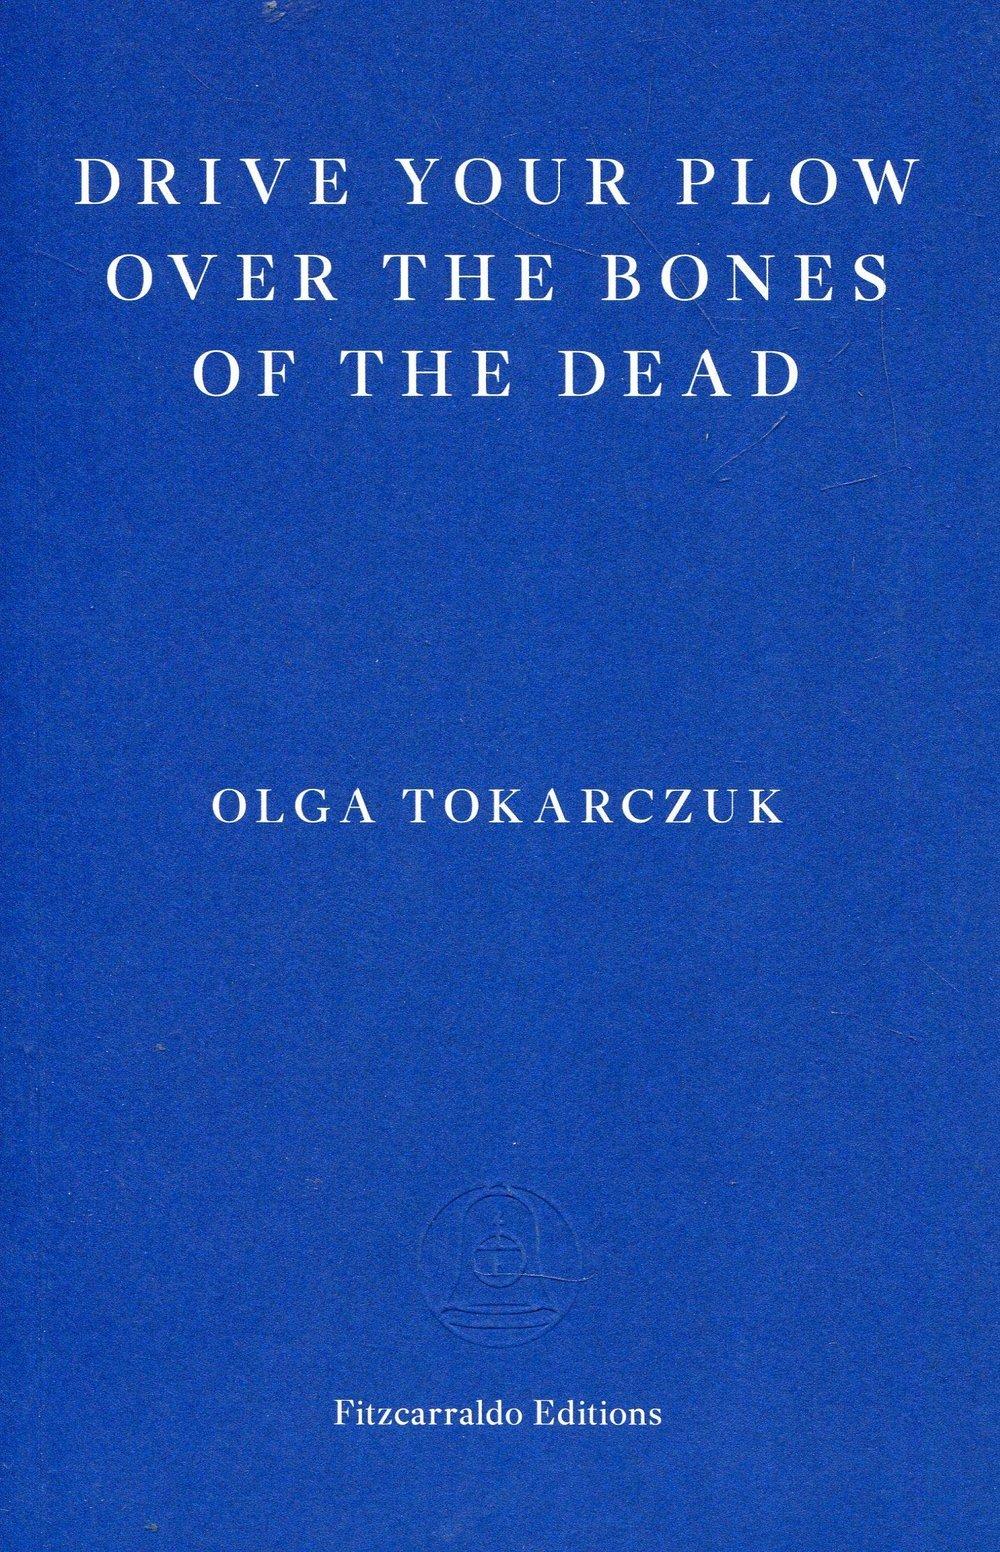 Fitzcarraldo Editions, September 2018, 272 pp